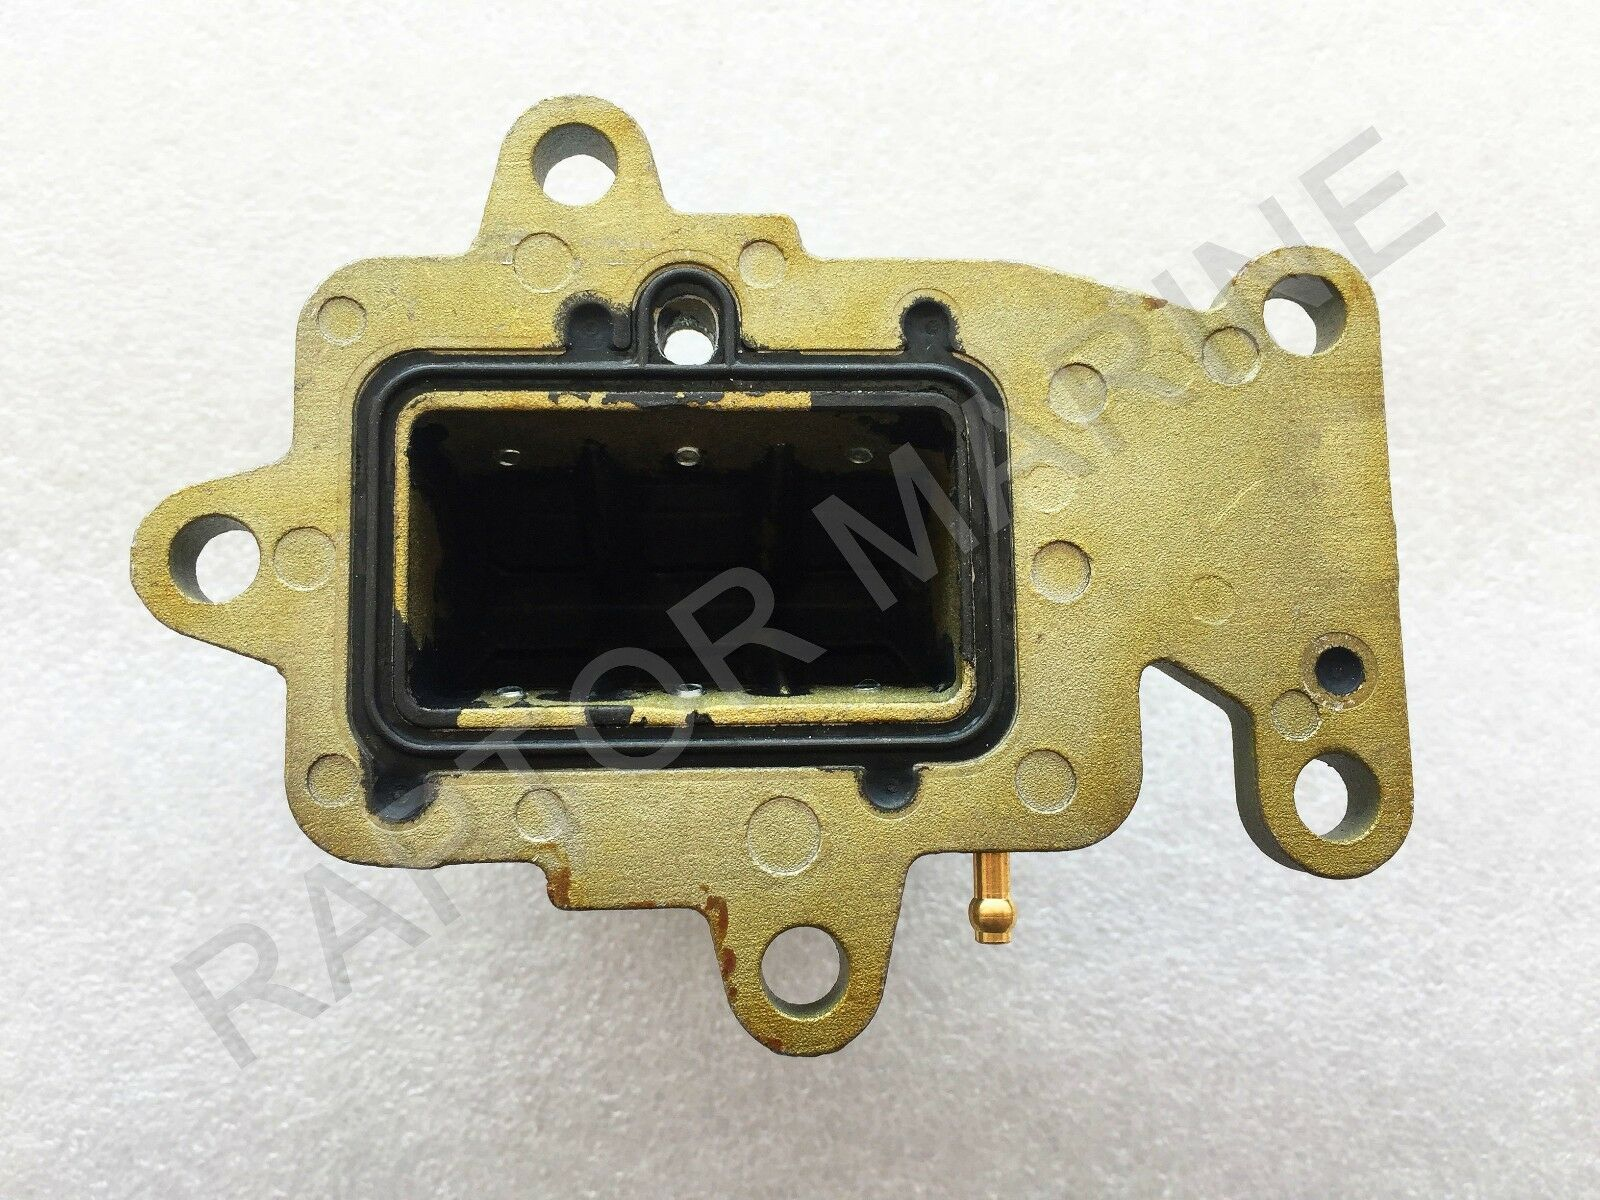 Reed valve assembly for YAMAHA outboard PN 63V-13610-10